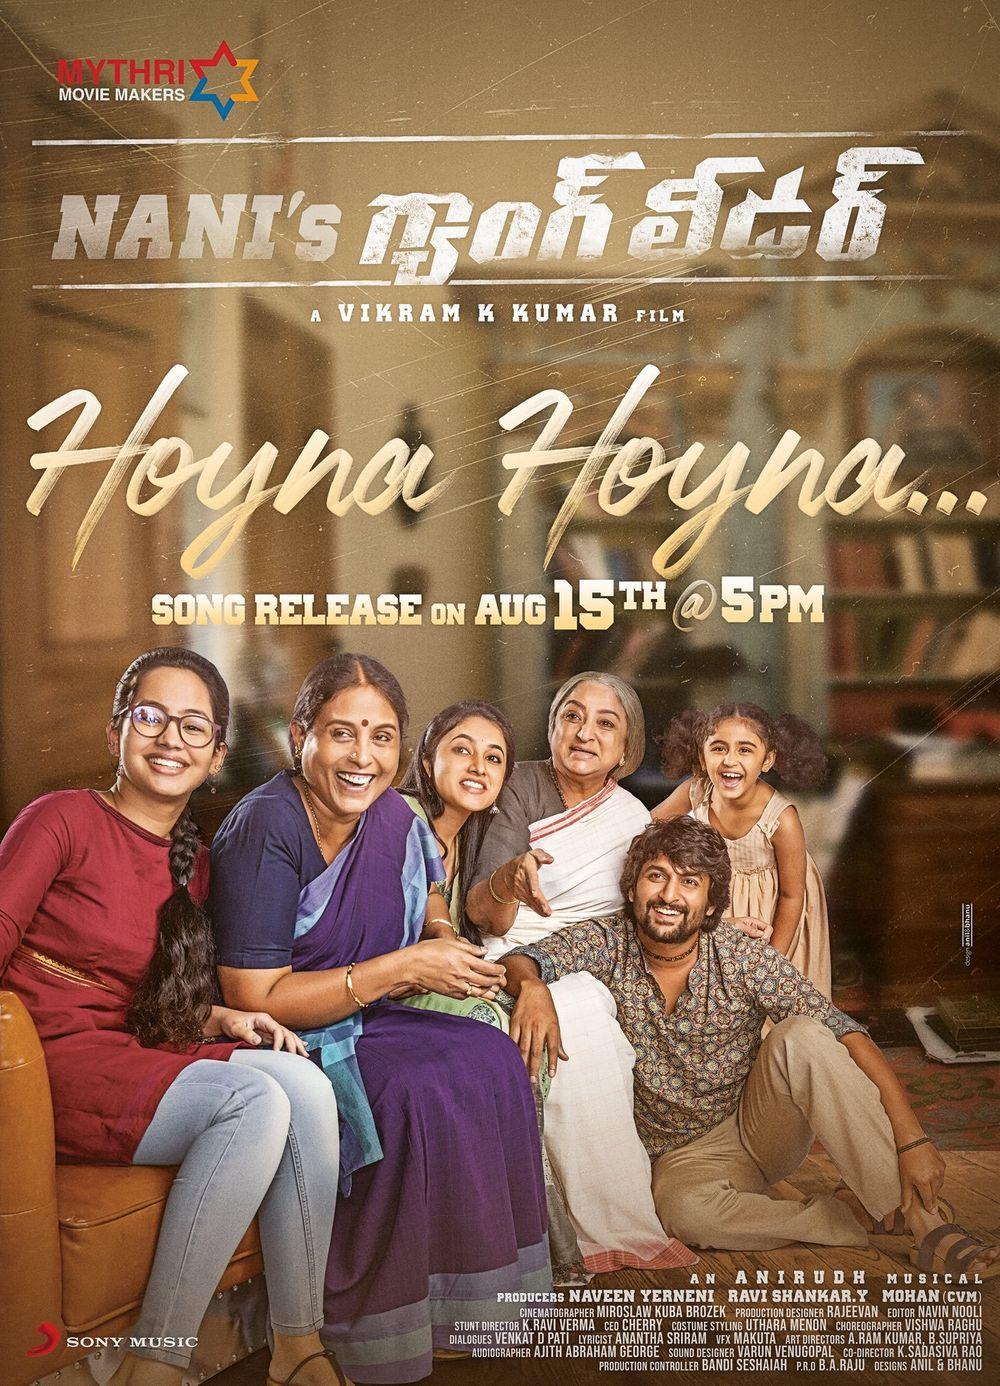 Nani Ghanta